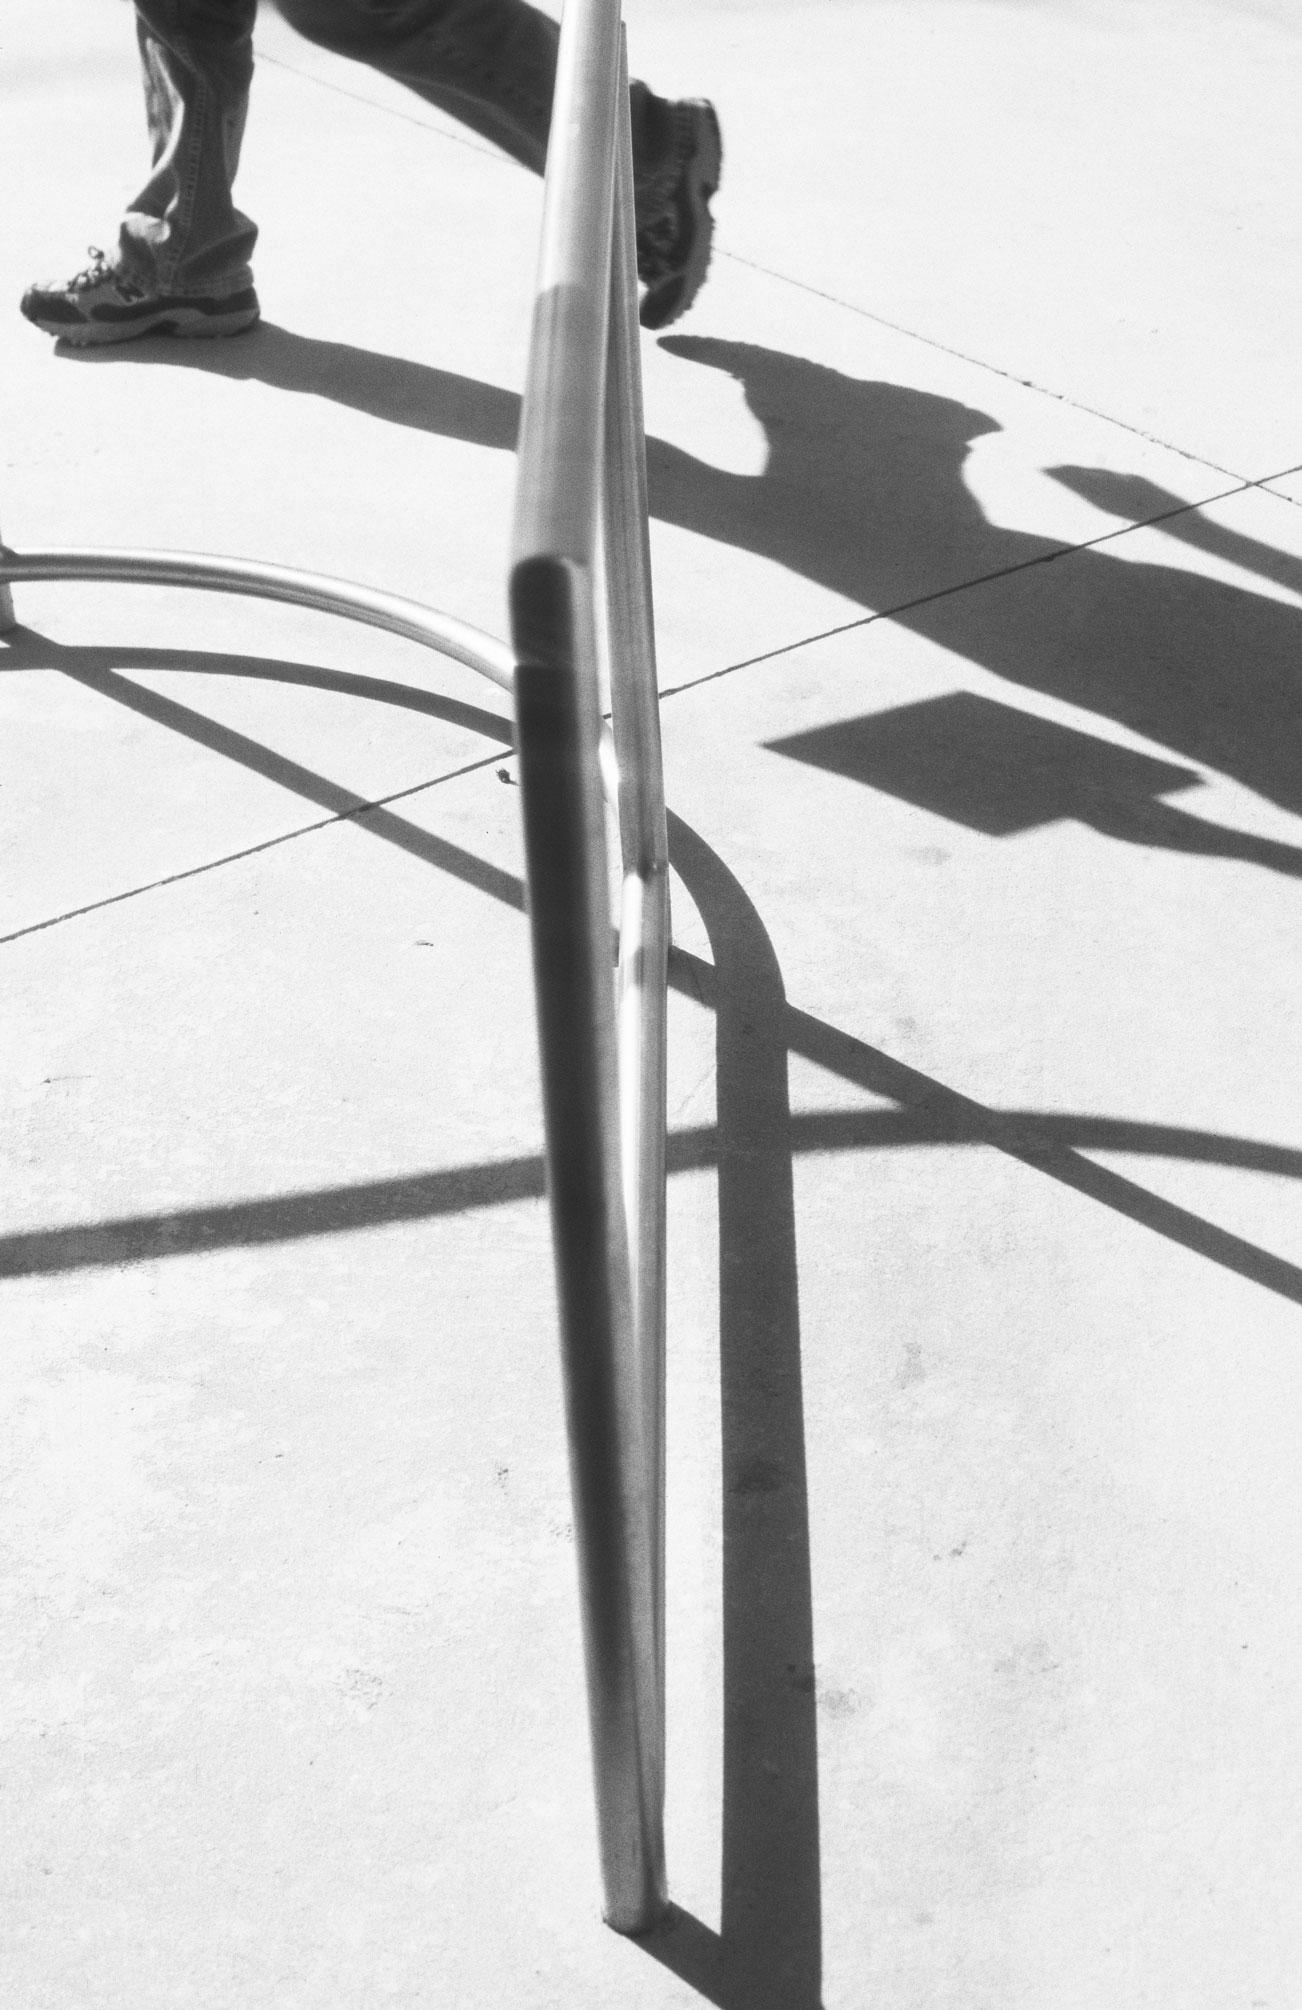 walking, 2007, 27 x 18 cm